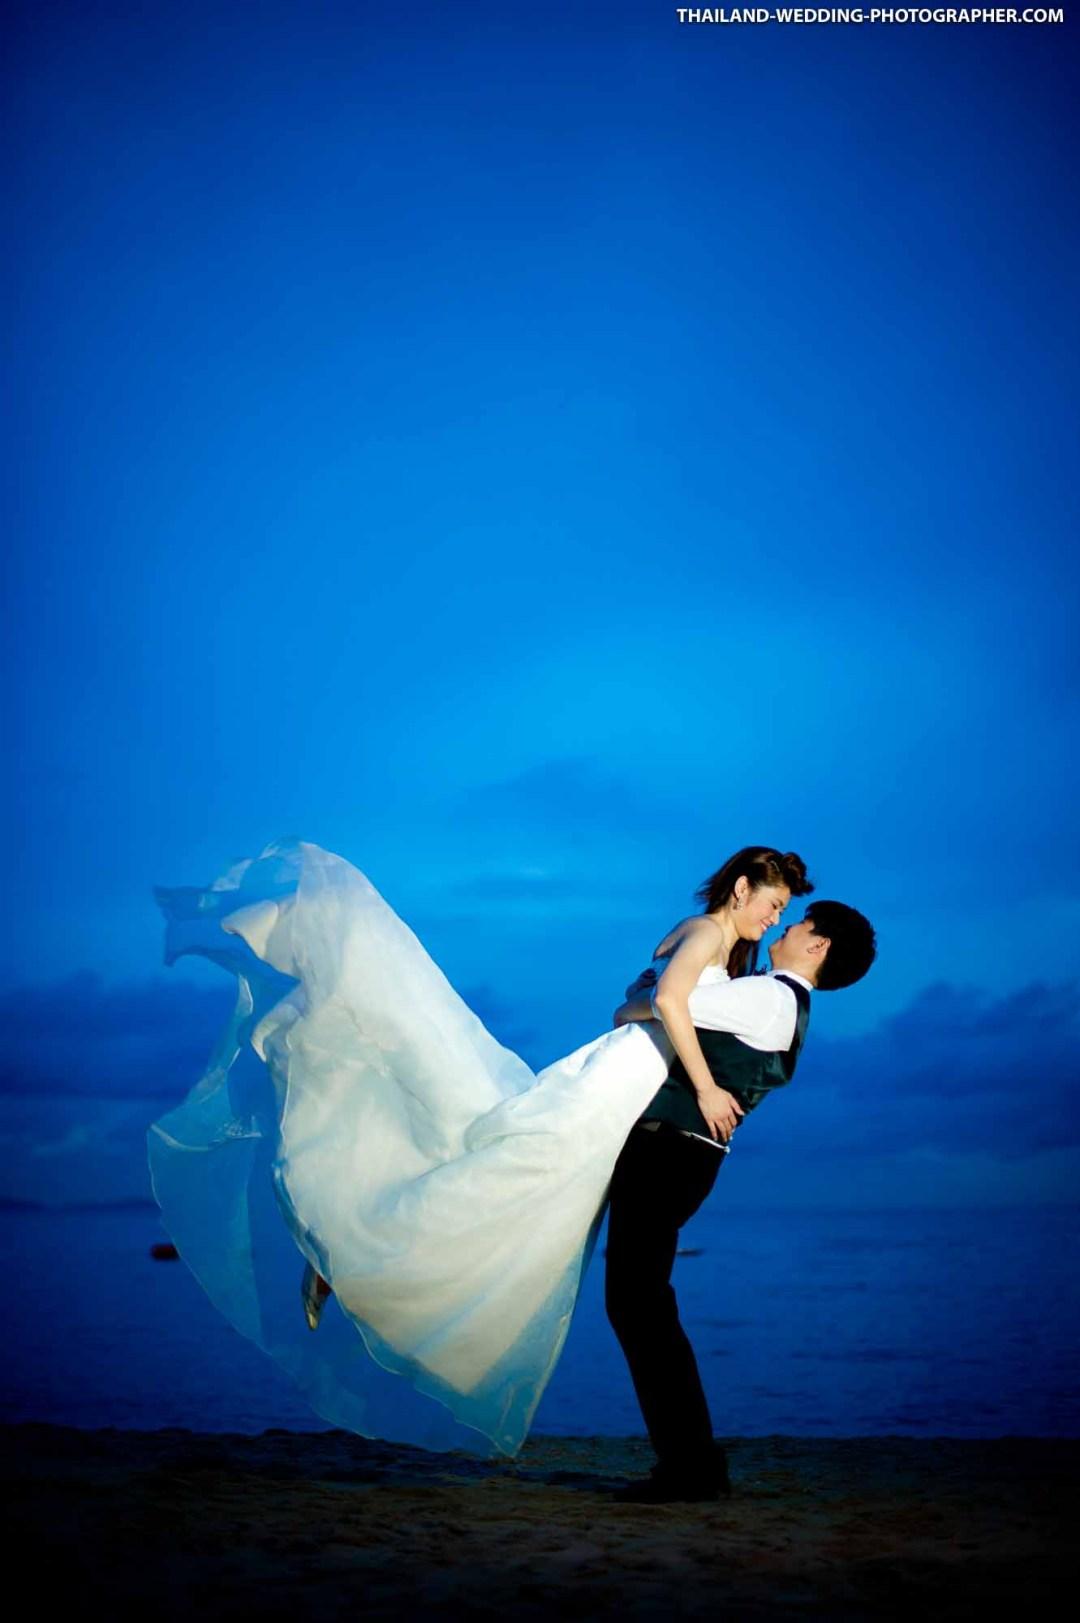 Pattaya Beach Thailand Prenuptial Photography (Engagement Session, Pre-Wedding)